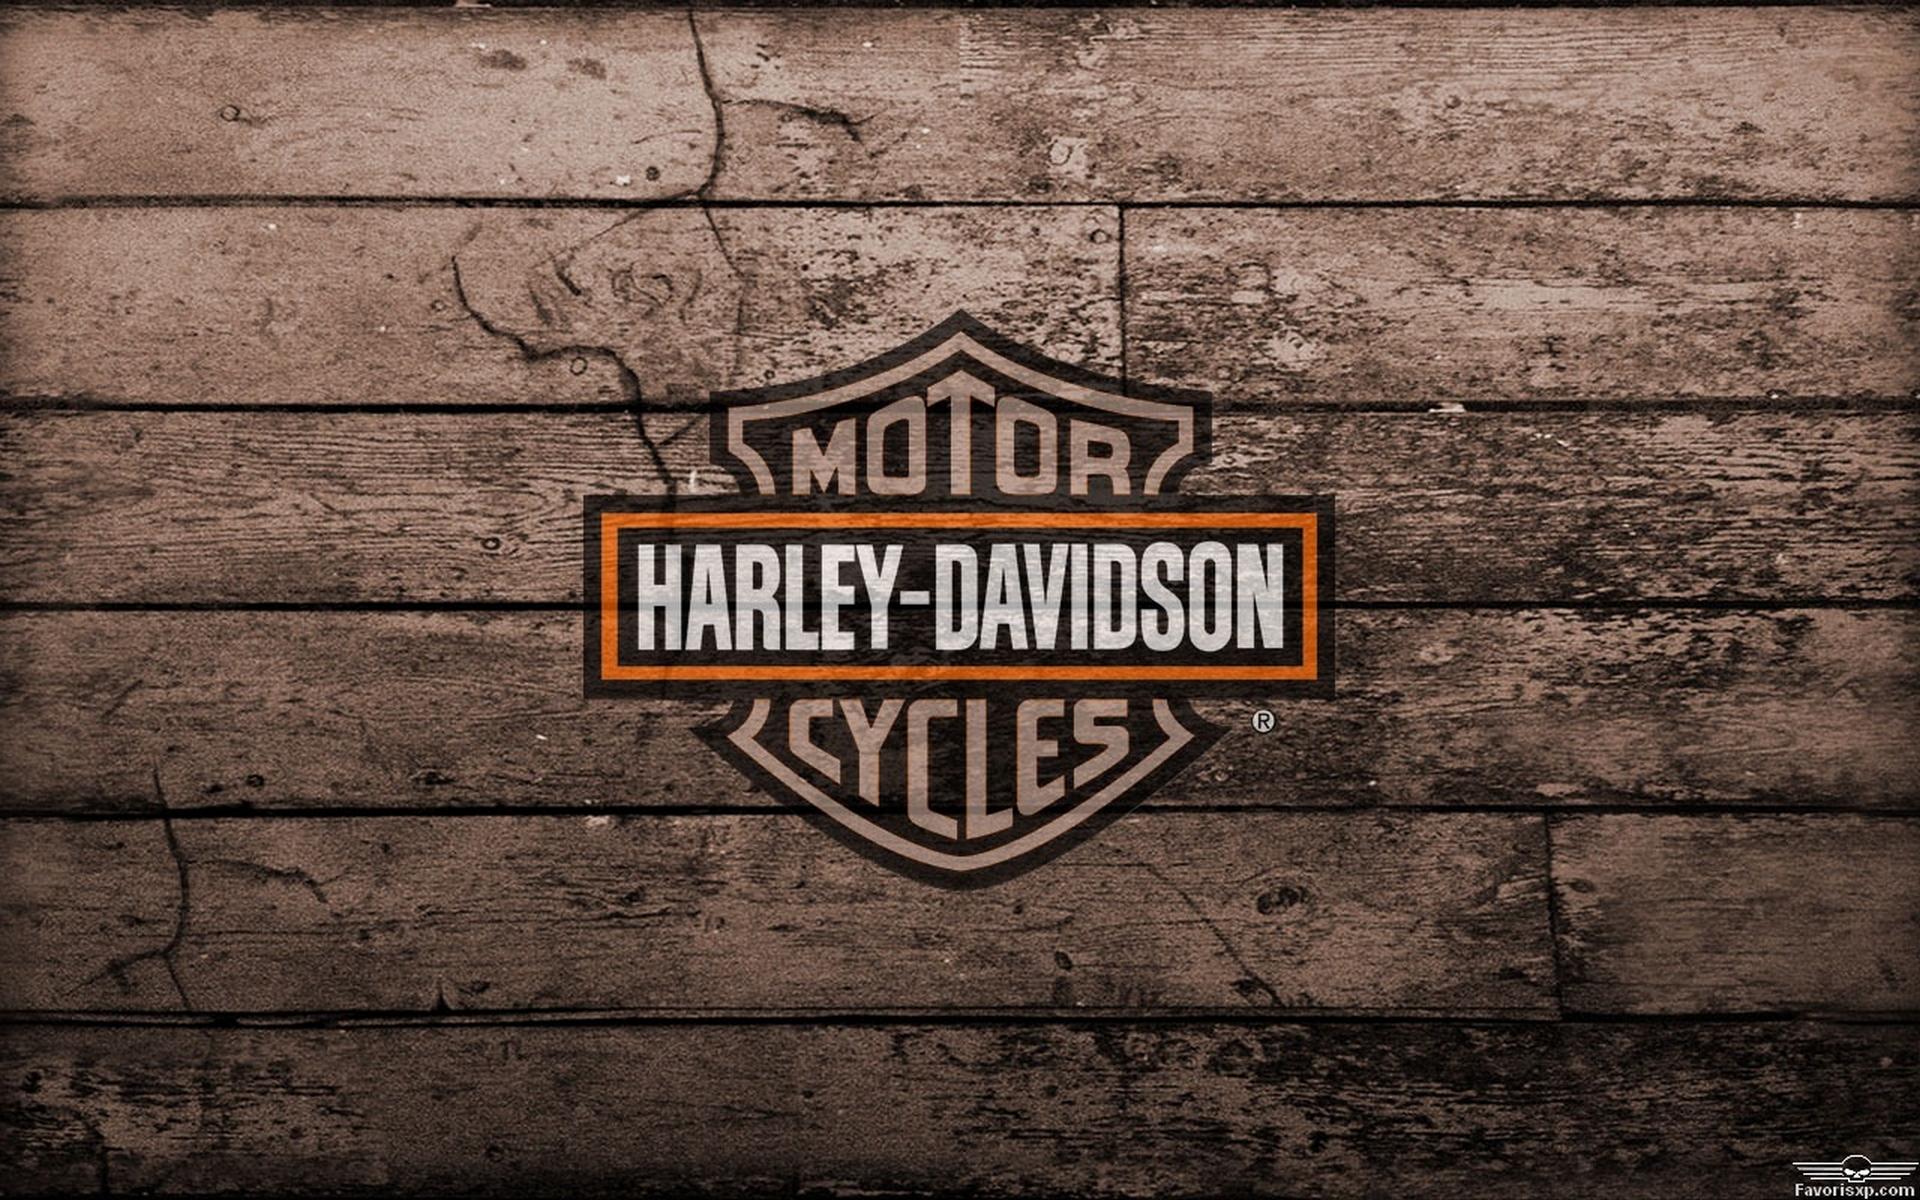 newest harley davidson logo wallpapers - photo #19